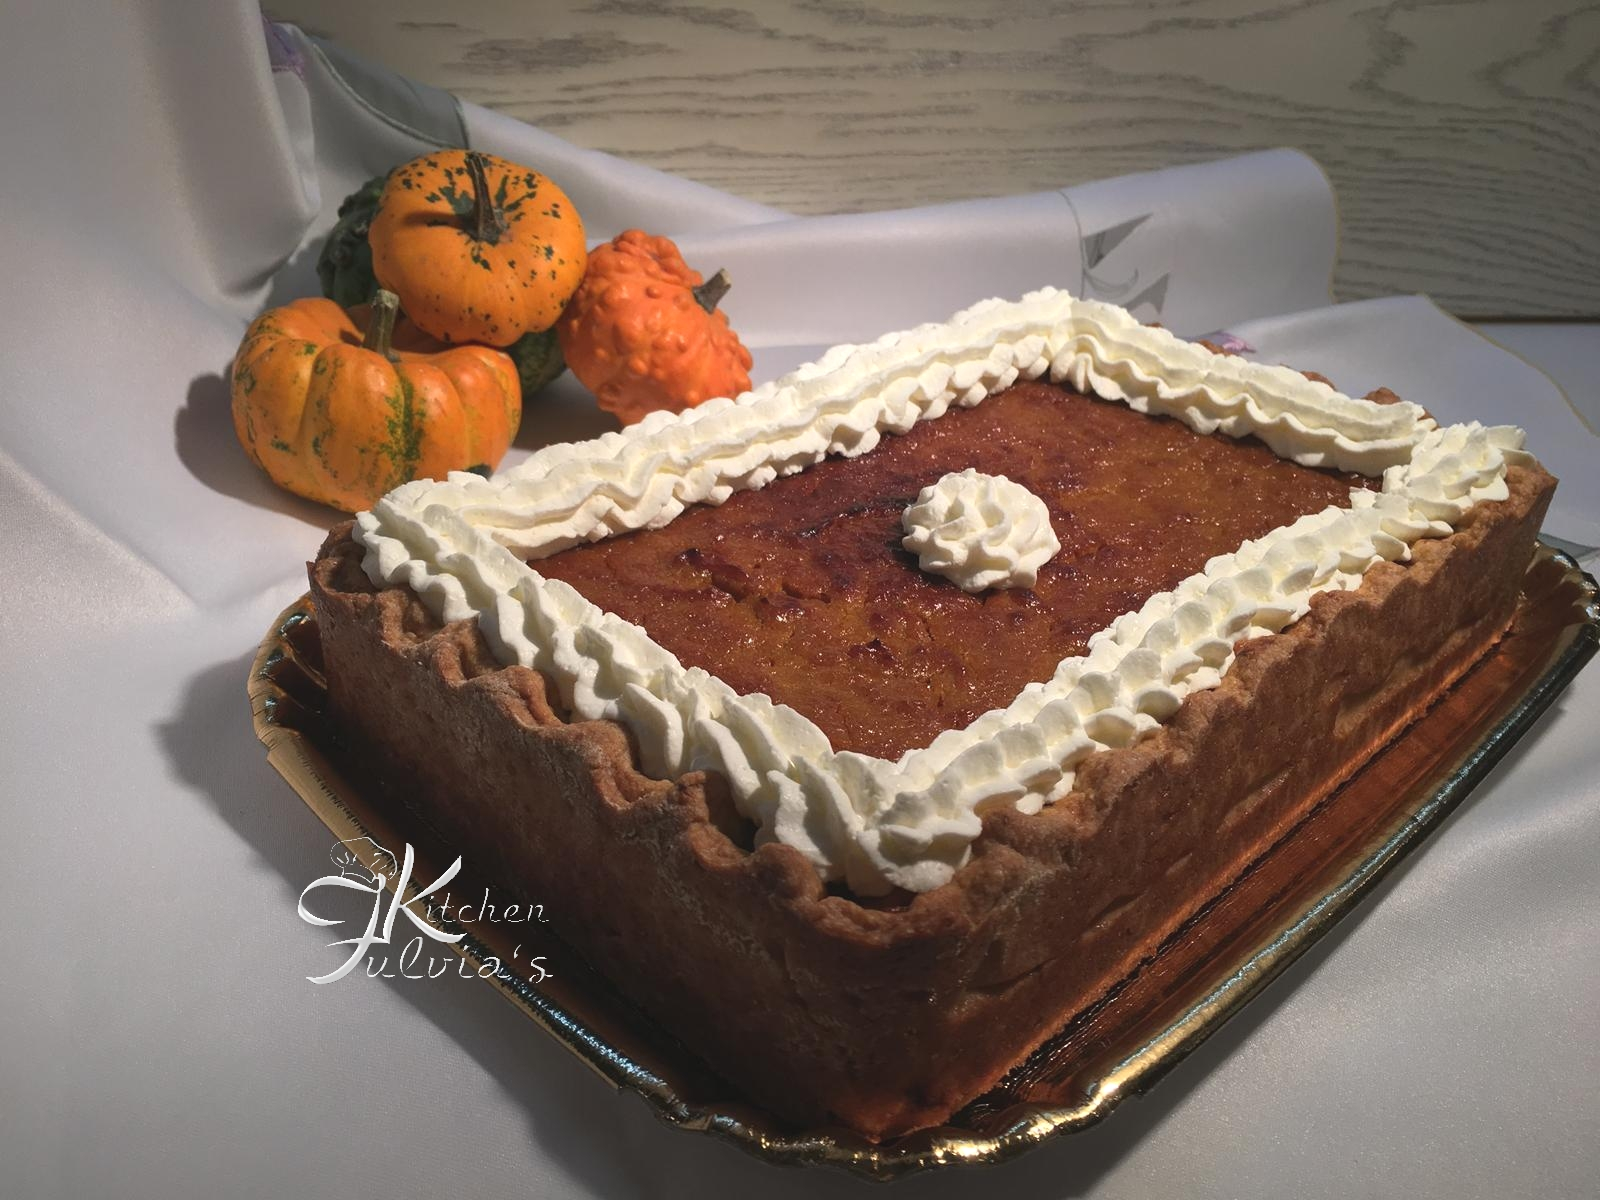 Pumpkin pie o crostata di zucca a modo mio – videoricetta